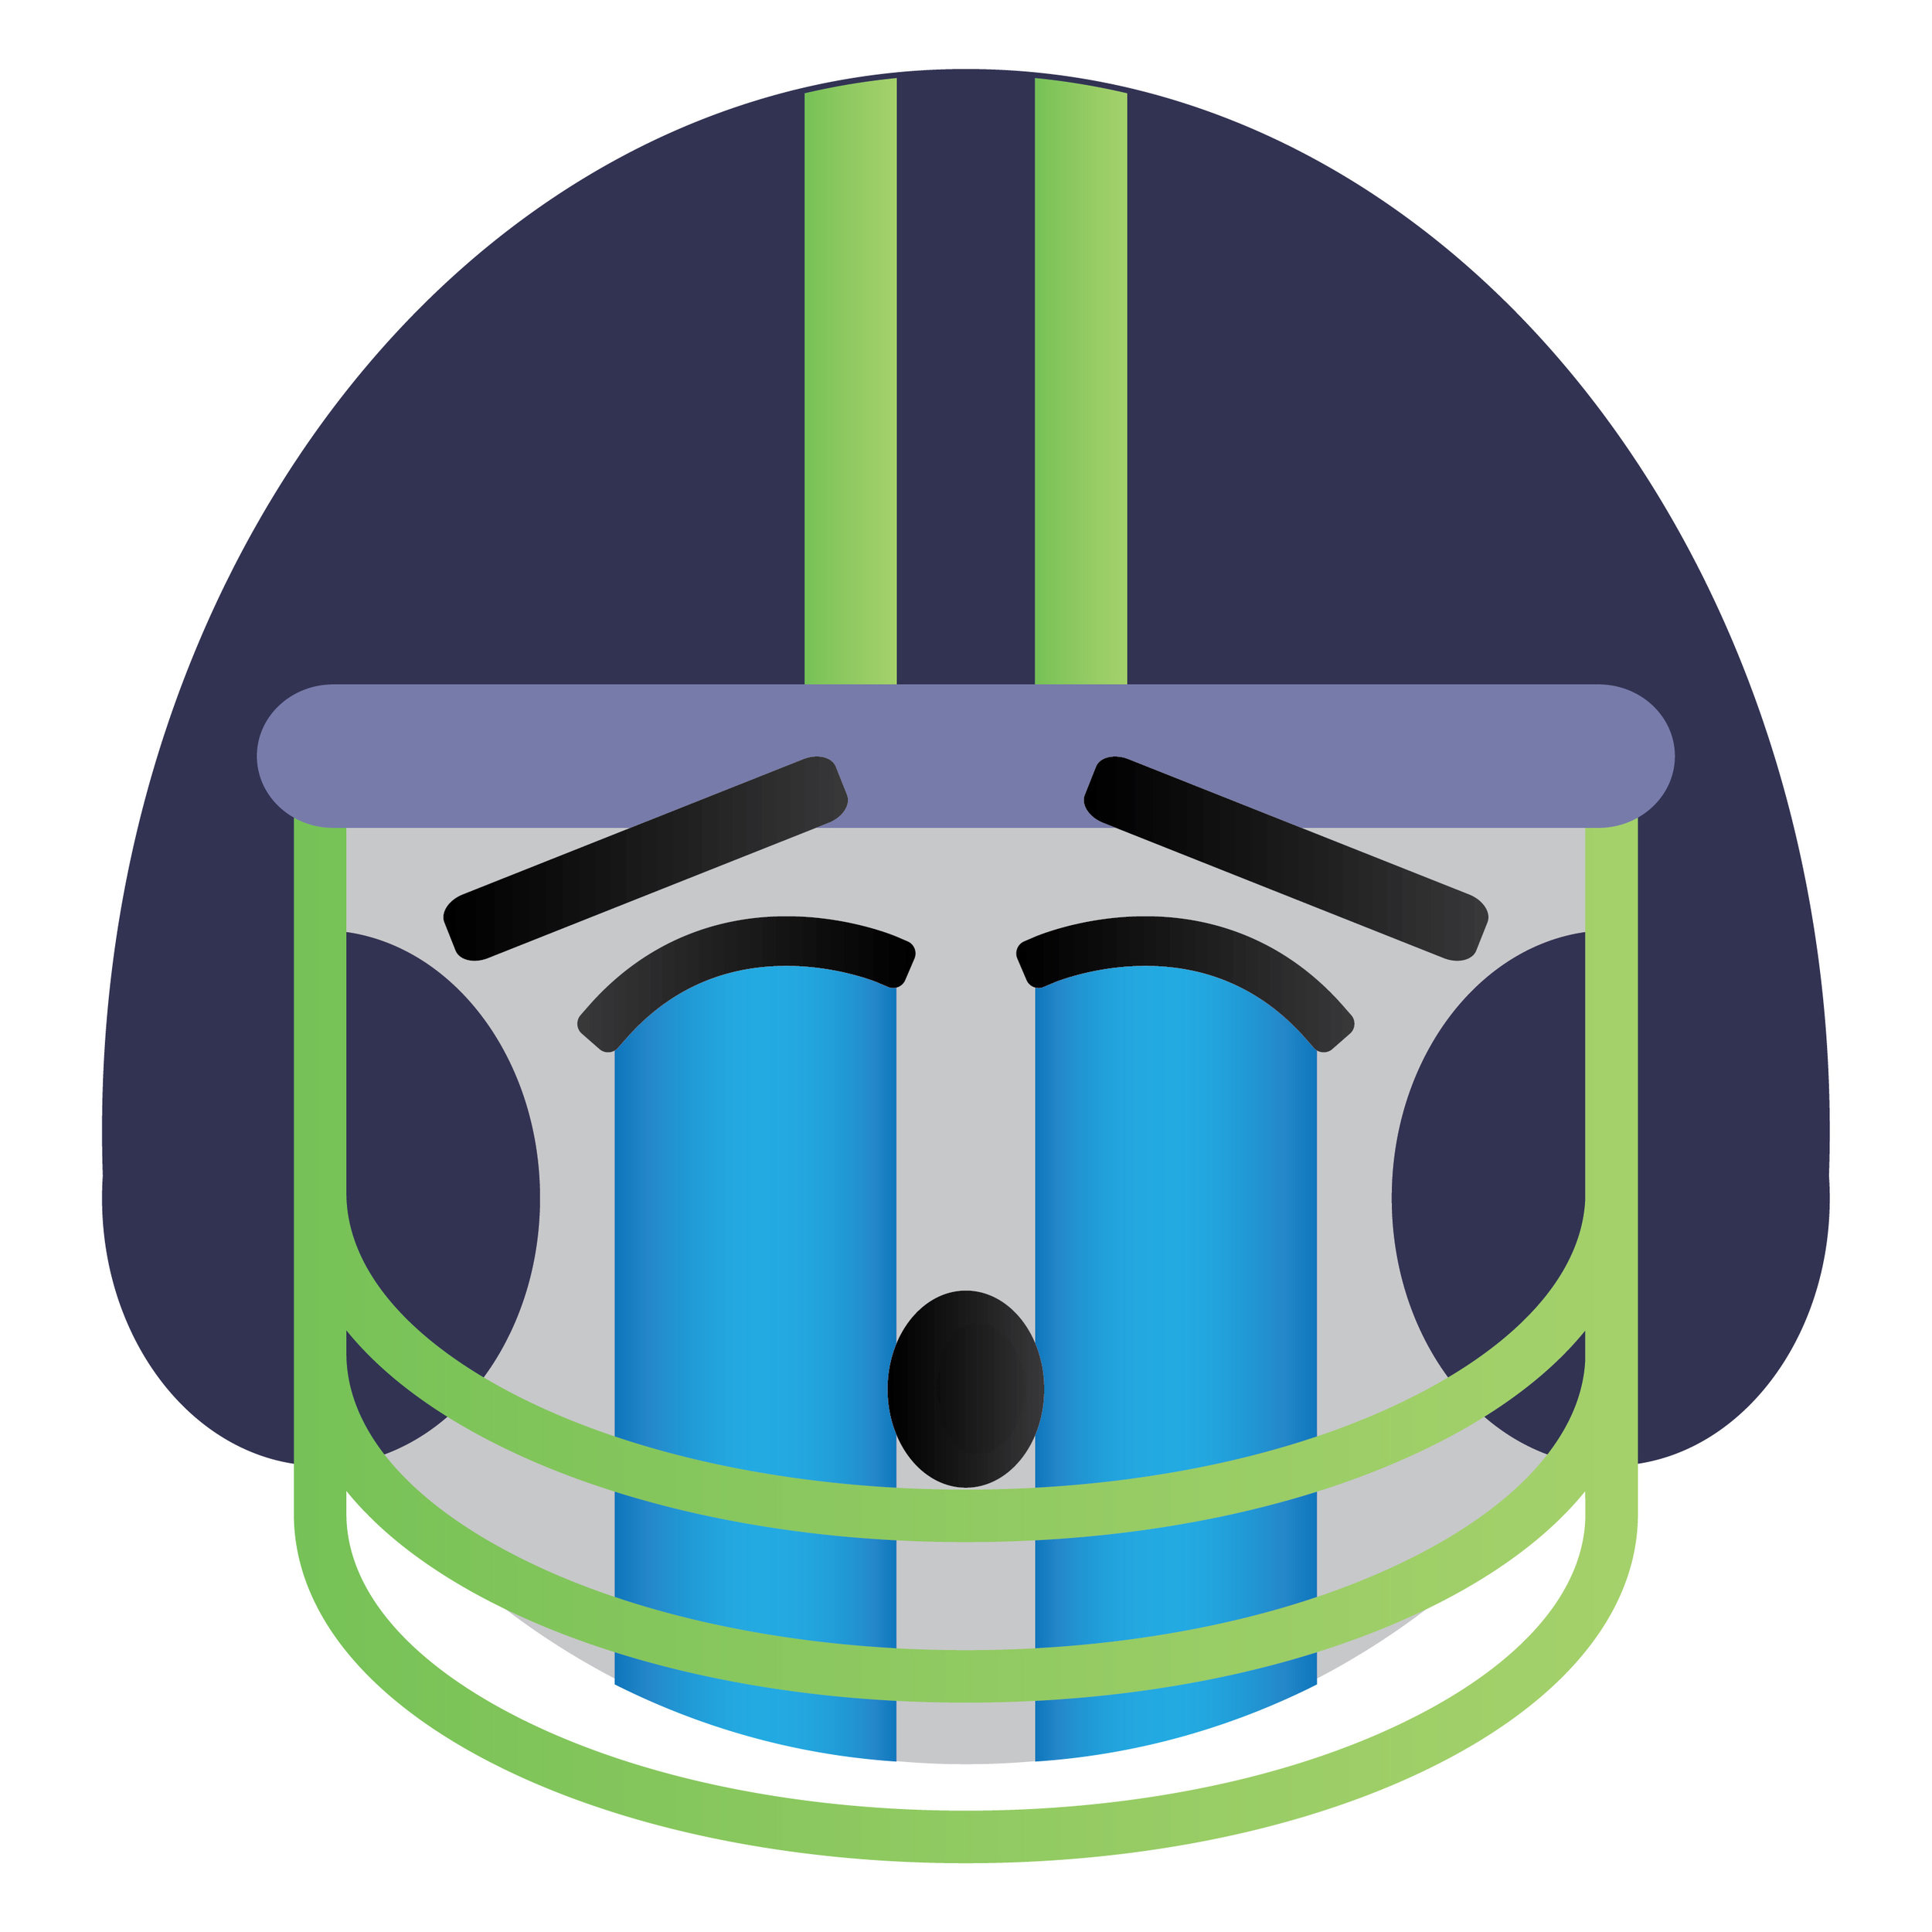 Emojis_Fall2018 [Recovered]_DM_Emoji_7.jpg